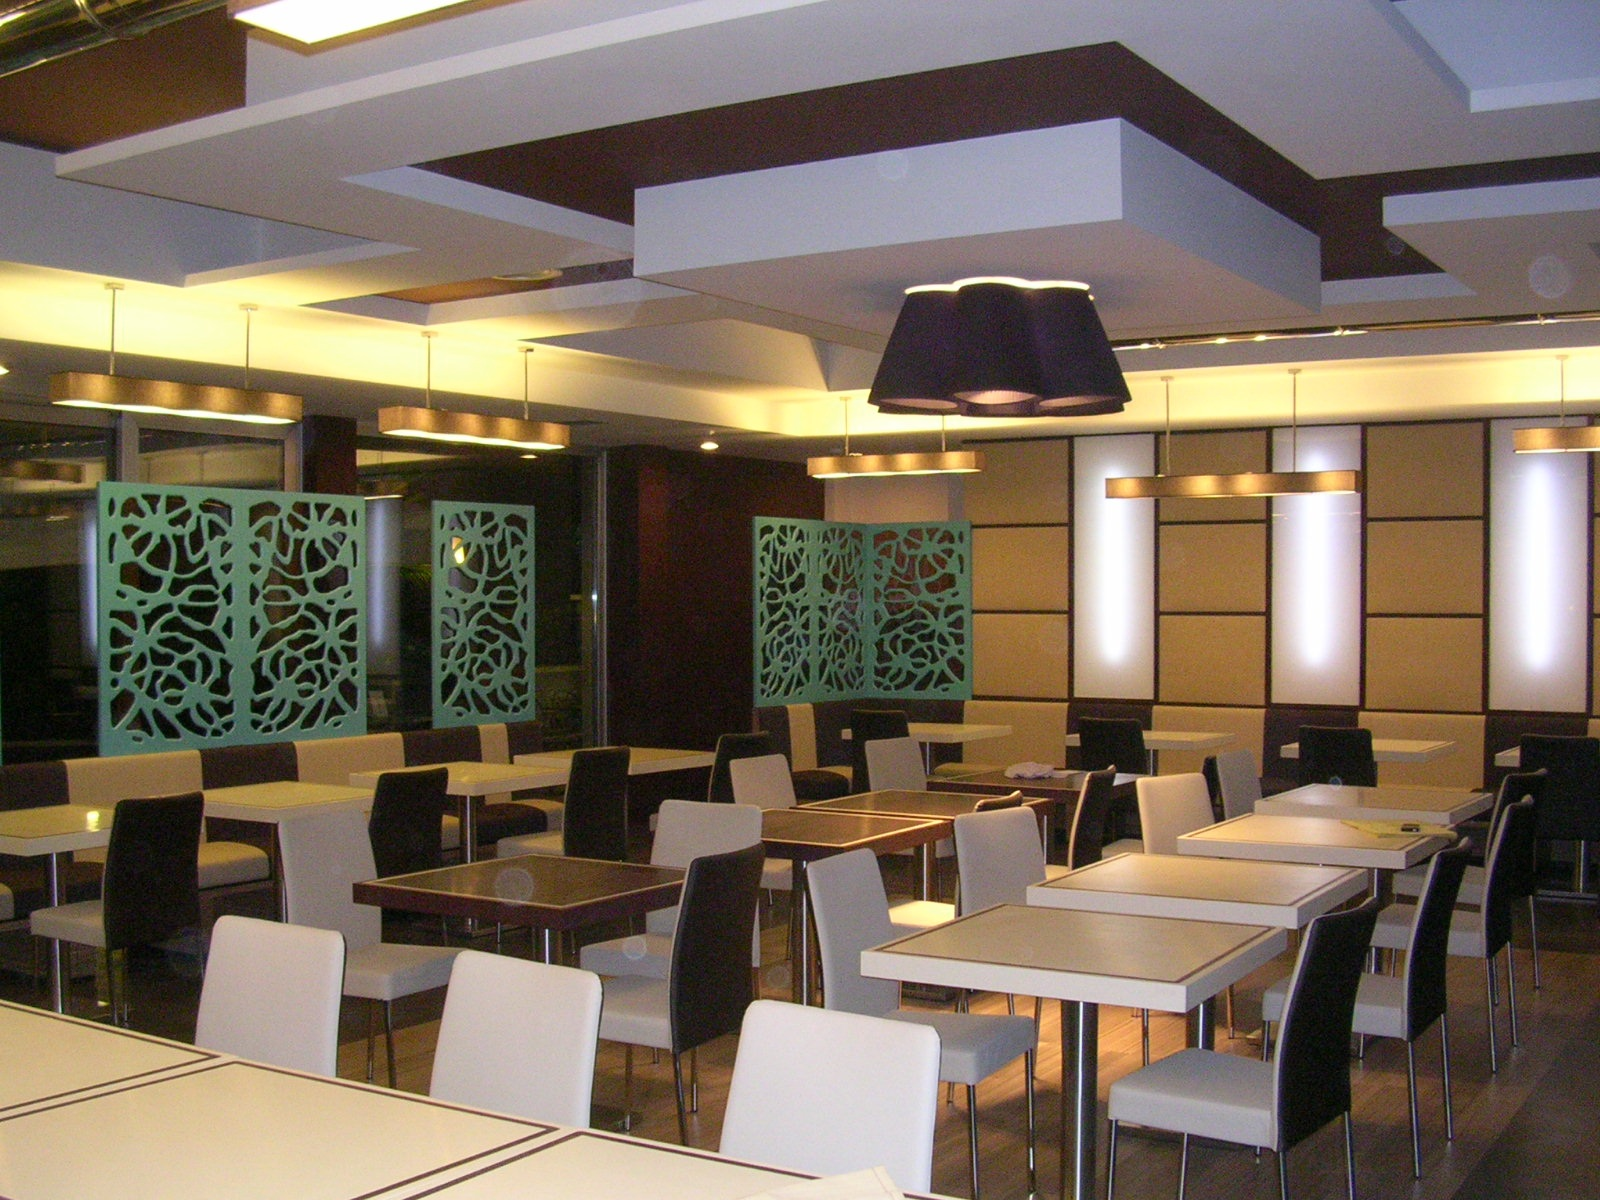 Arredi per ristoranti falegnameria rd arredamenti s r l for Sala arredamento